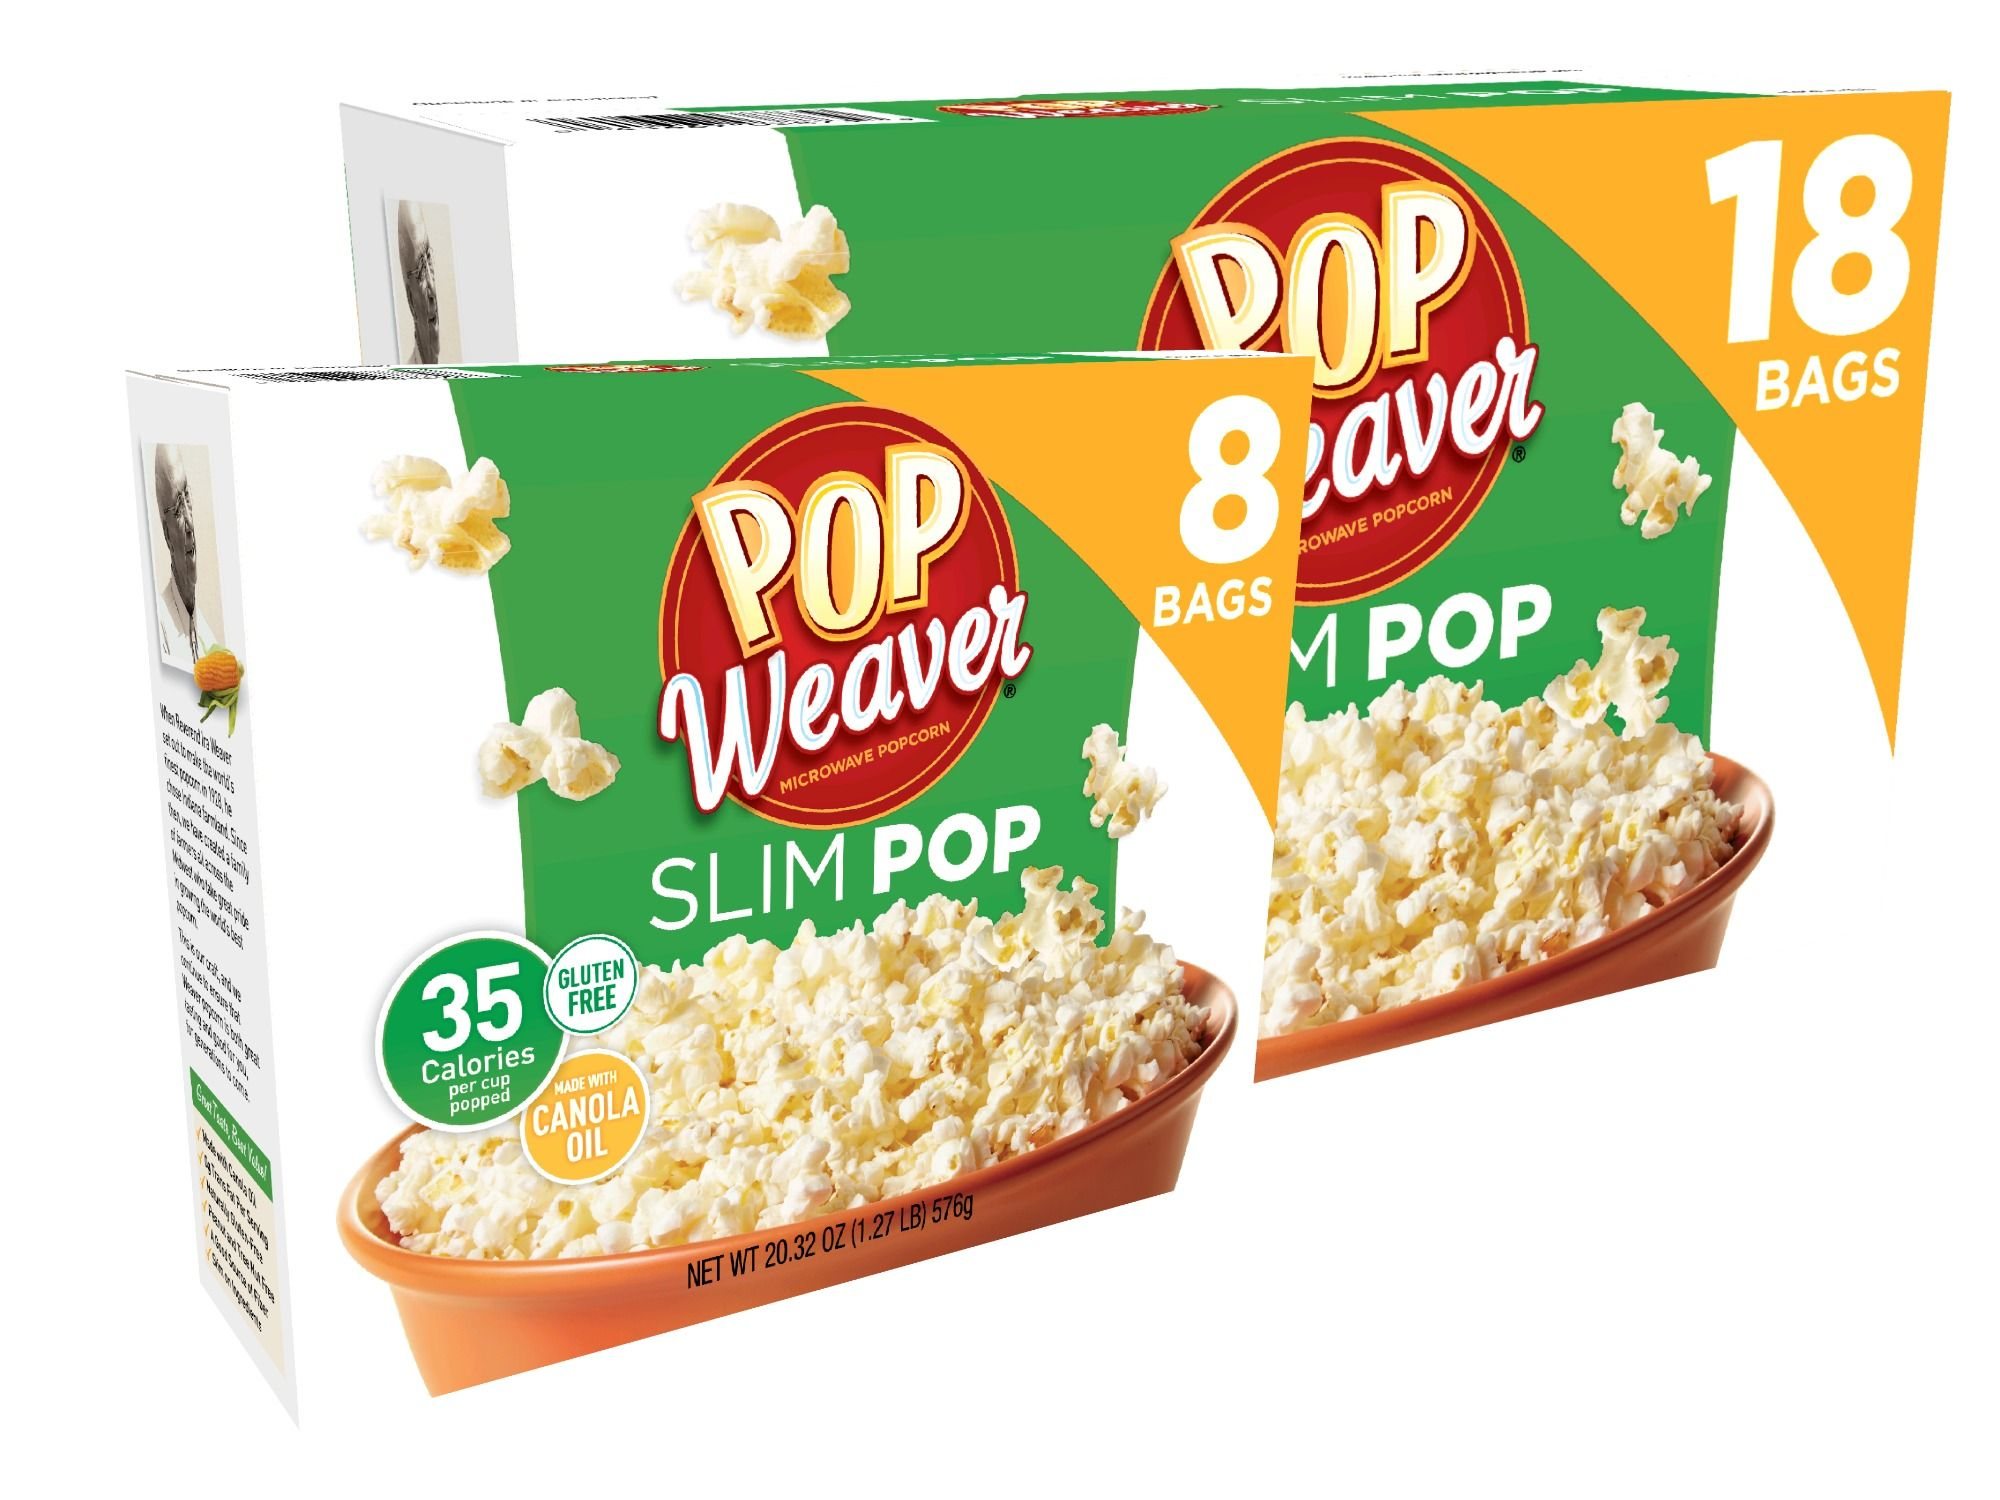 Pop Weaver Is Proud To Introduce Slim Microwave Popcorn As The Newest Member In